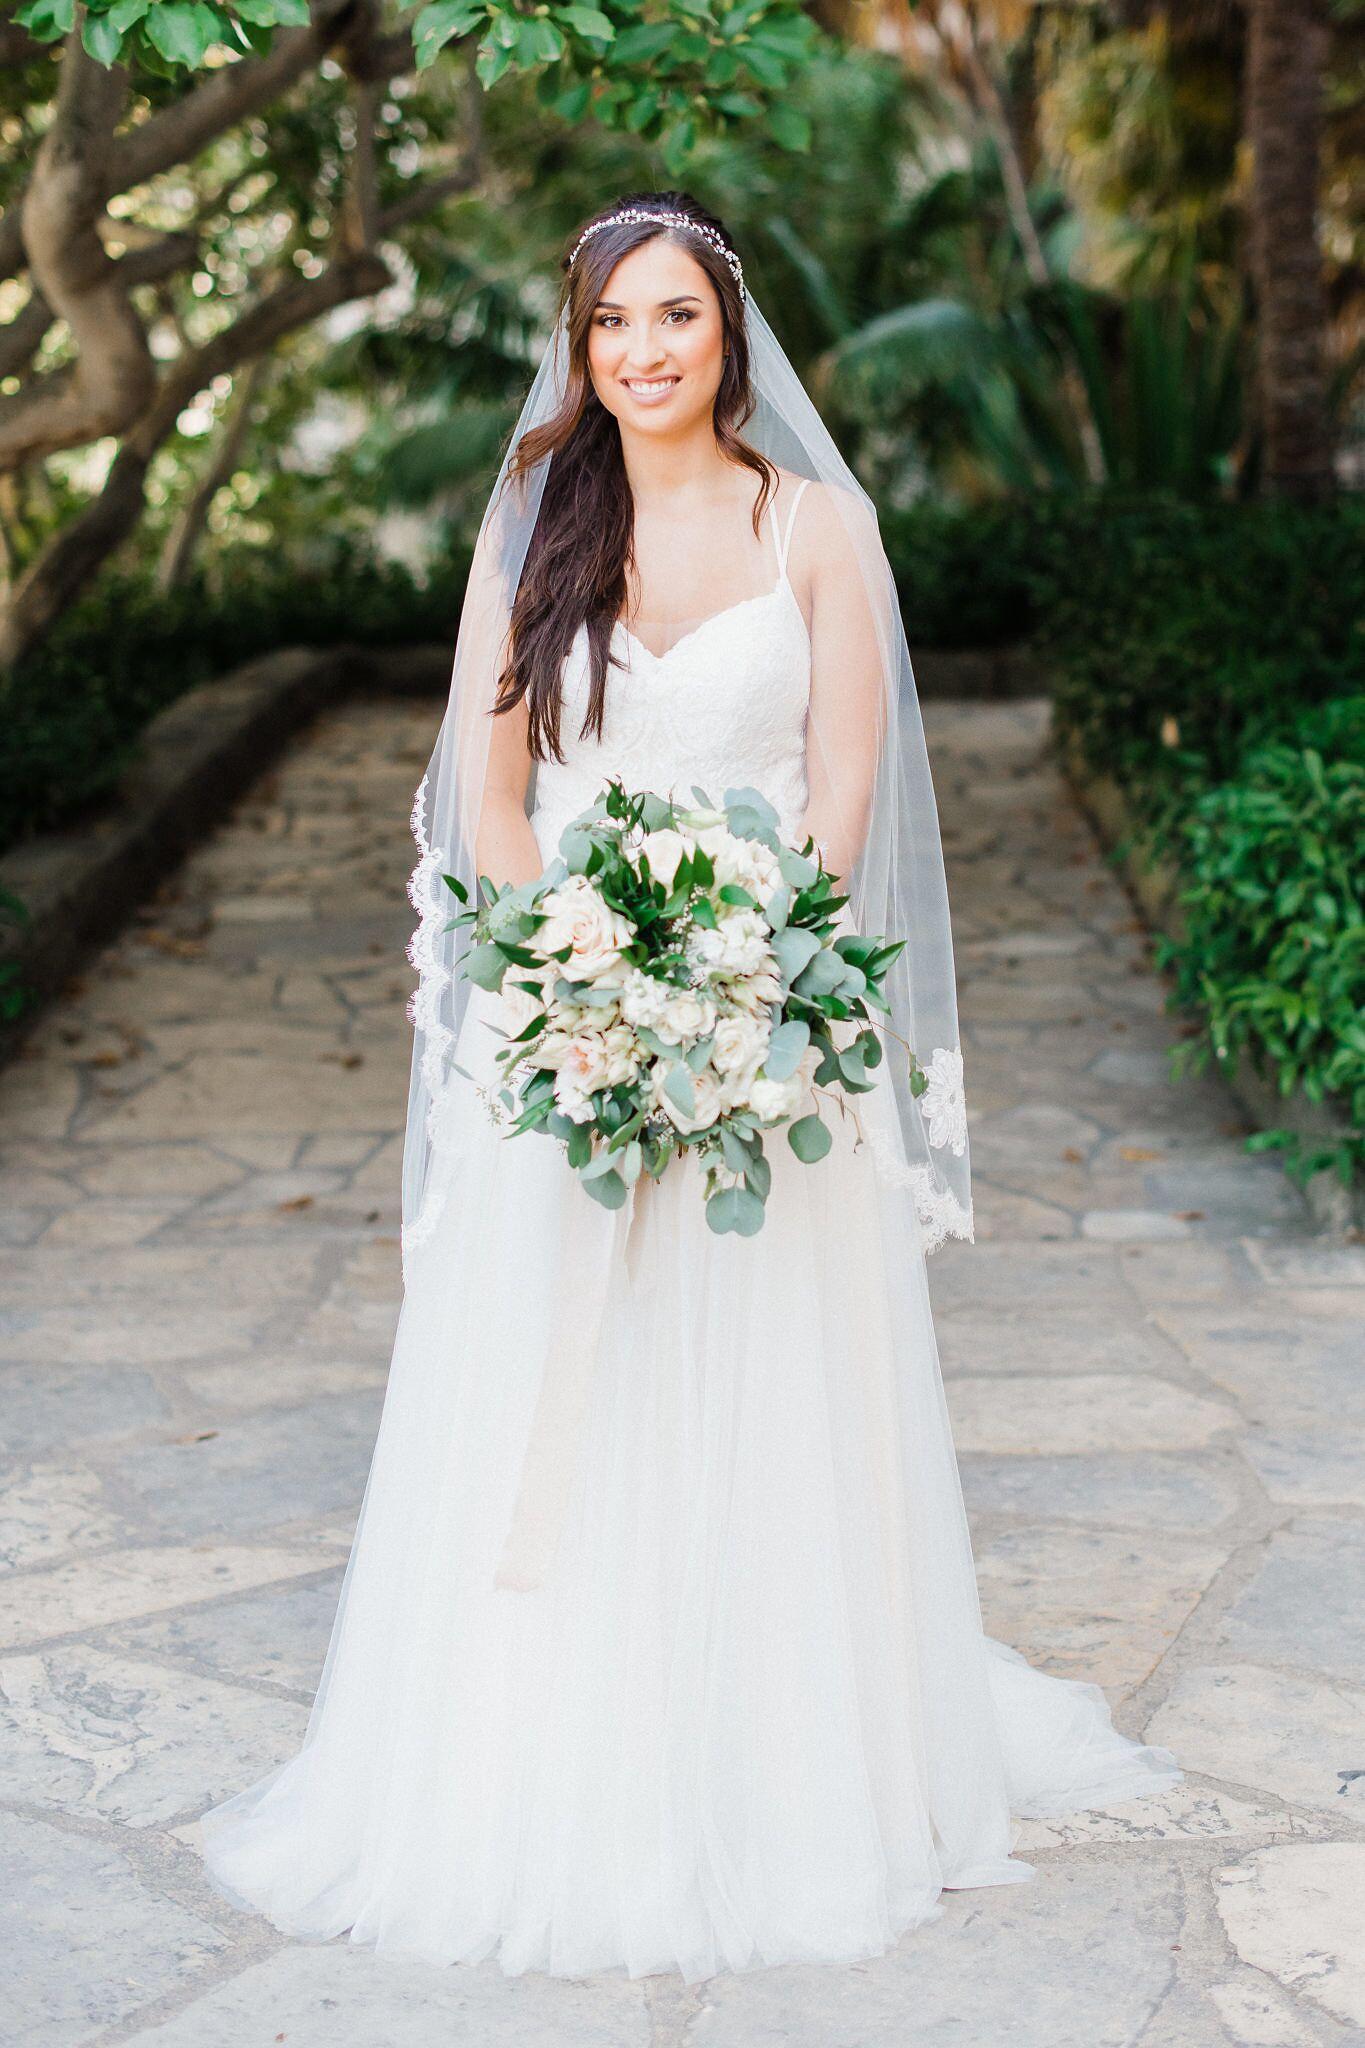 www.santabarbaraweddings.com | Photographer: Grace Kathryn | Venues: Villa & Vine, Santa Barbara Courthouse, Hilton Santa Barbara Resort | Coordination: Burlap & Bordeaux | Bride and Bouquet